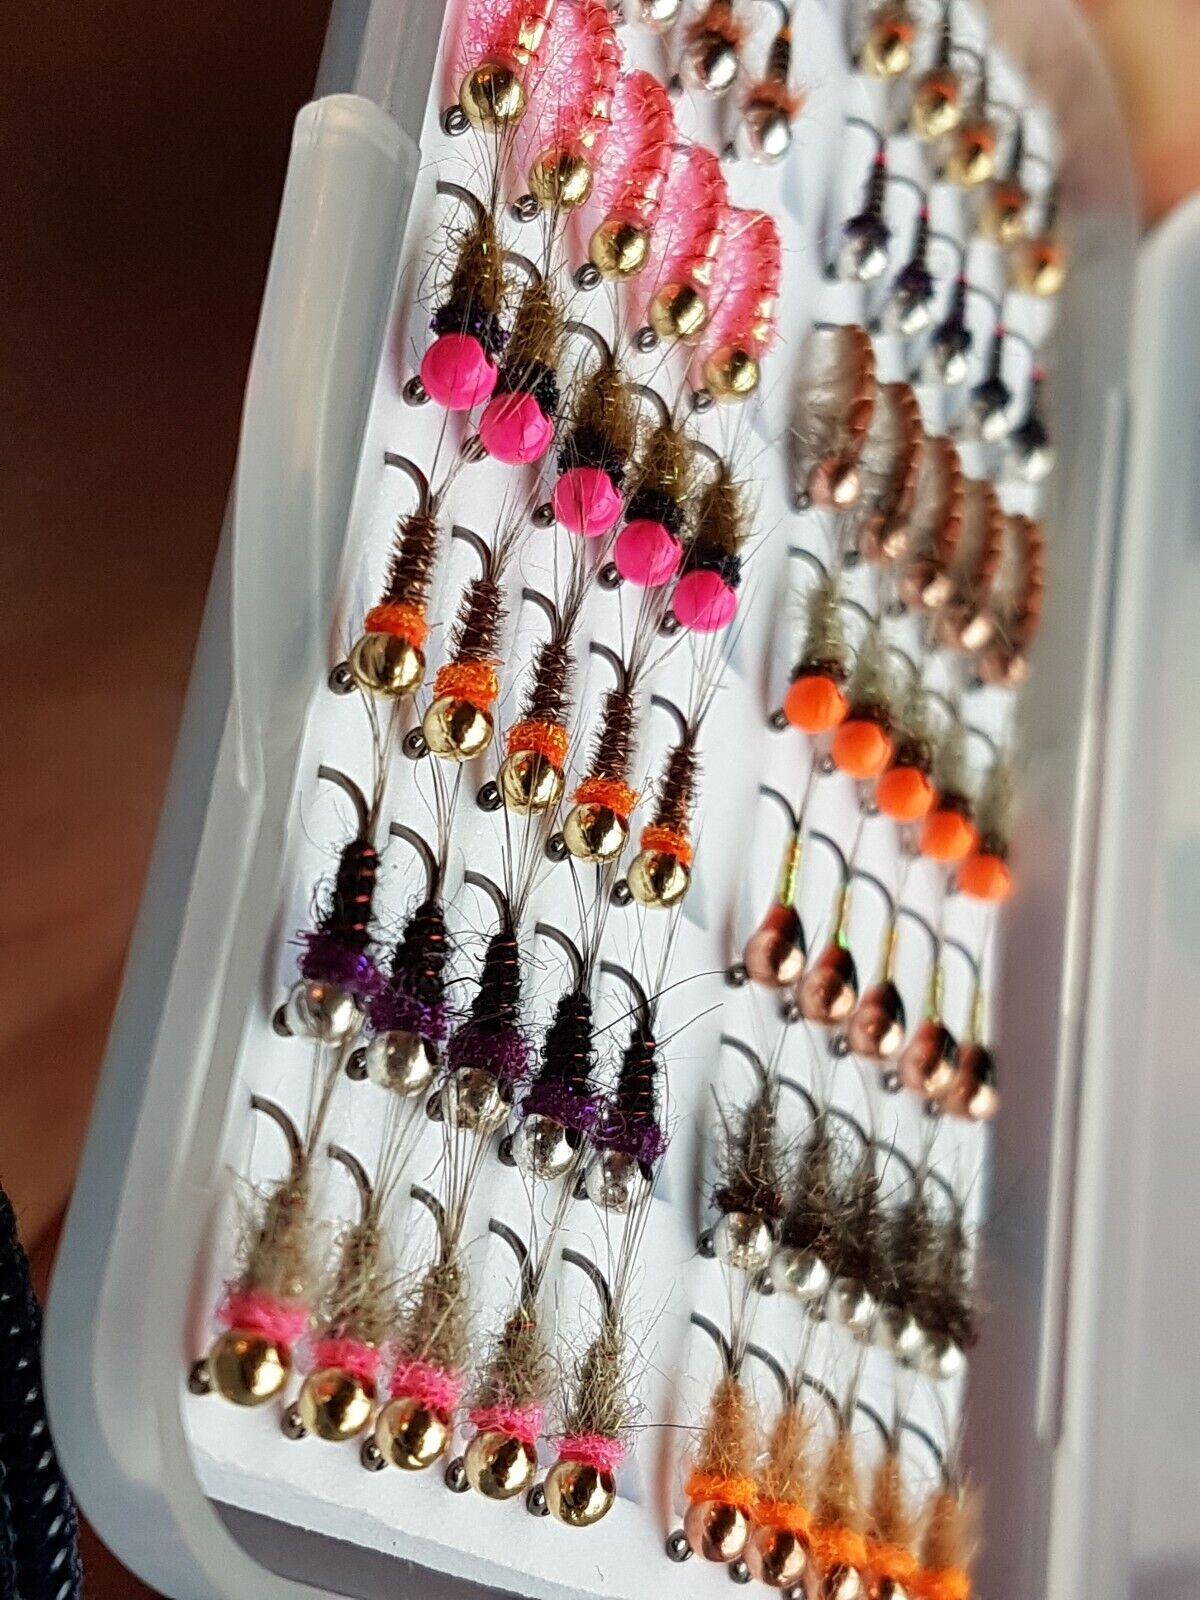 Tungsten River Nymphs Size 16 Jig Hooks 3mm Beads X 70